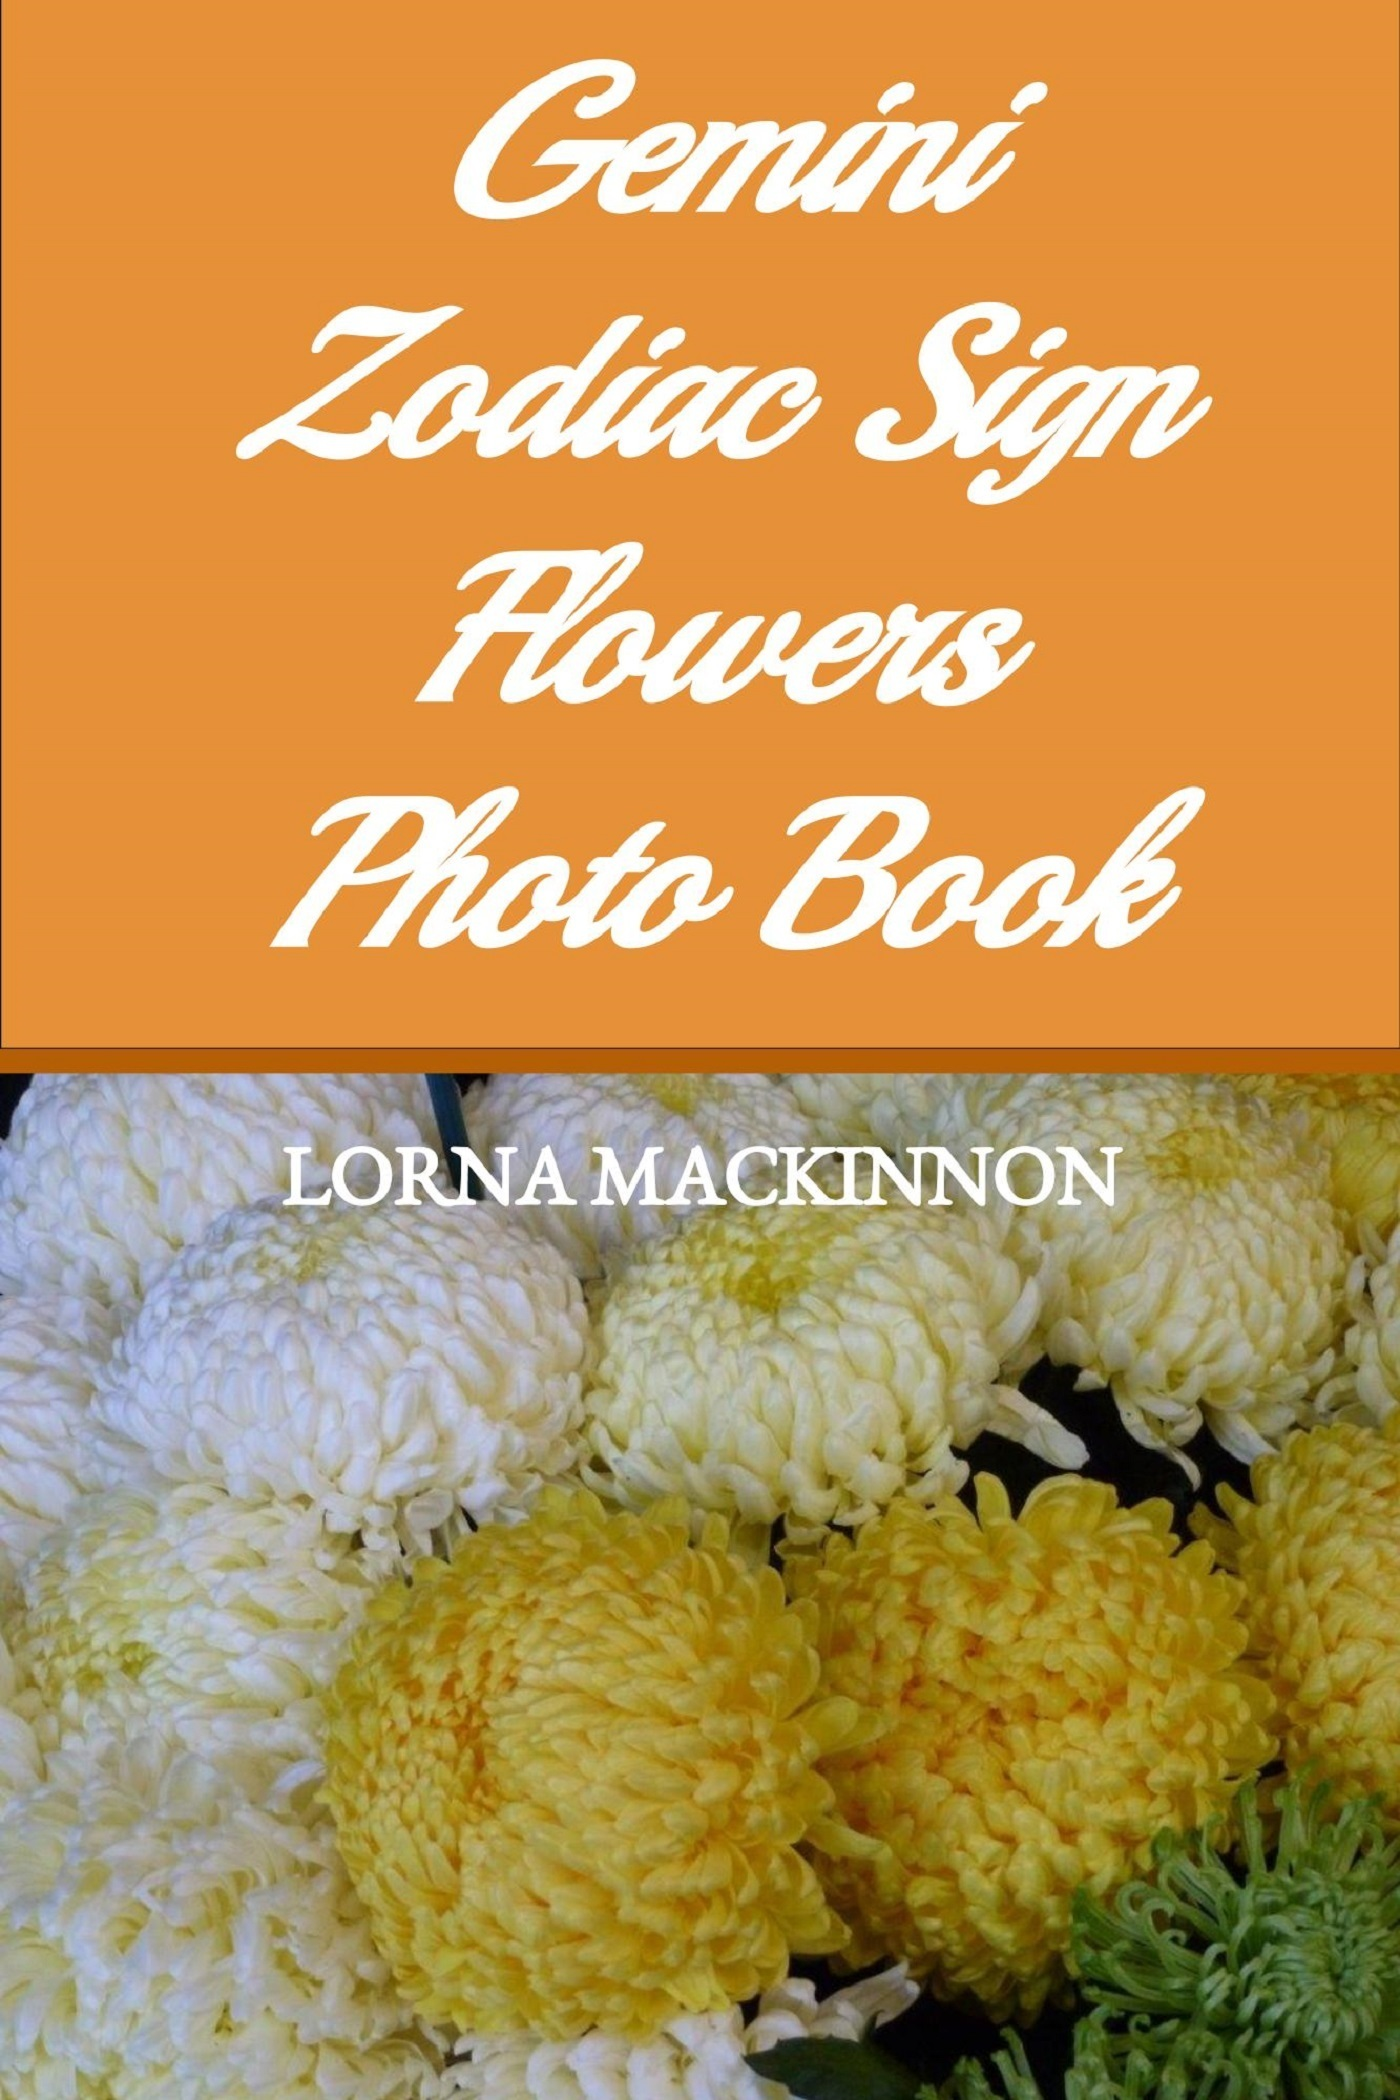 Gemini Zodiac Sign Flowers Photo Book Lorna Mackinnon